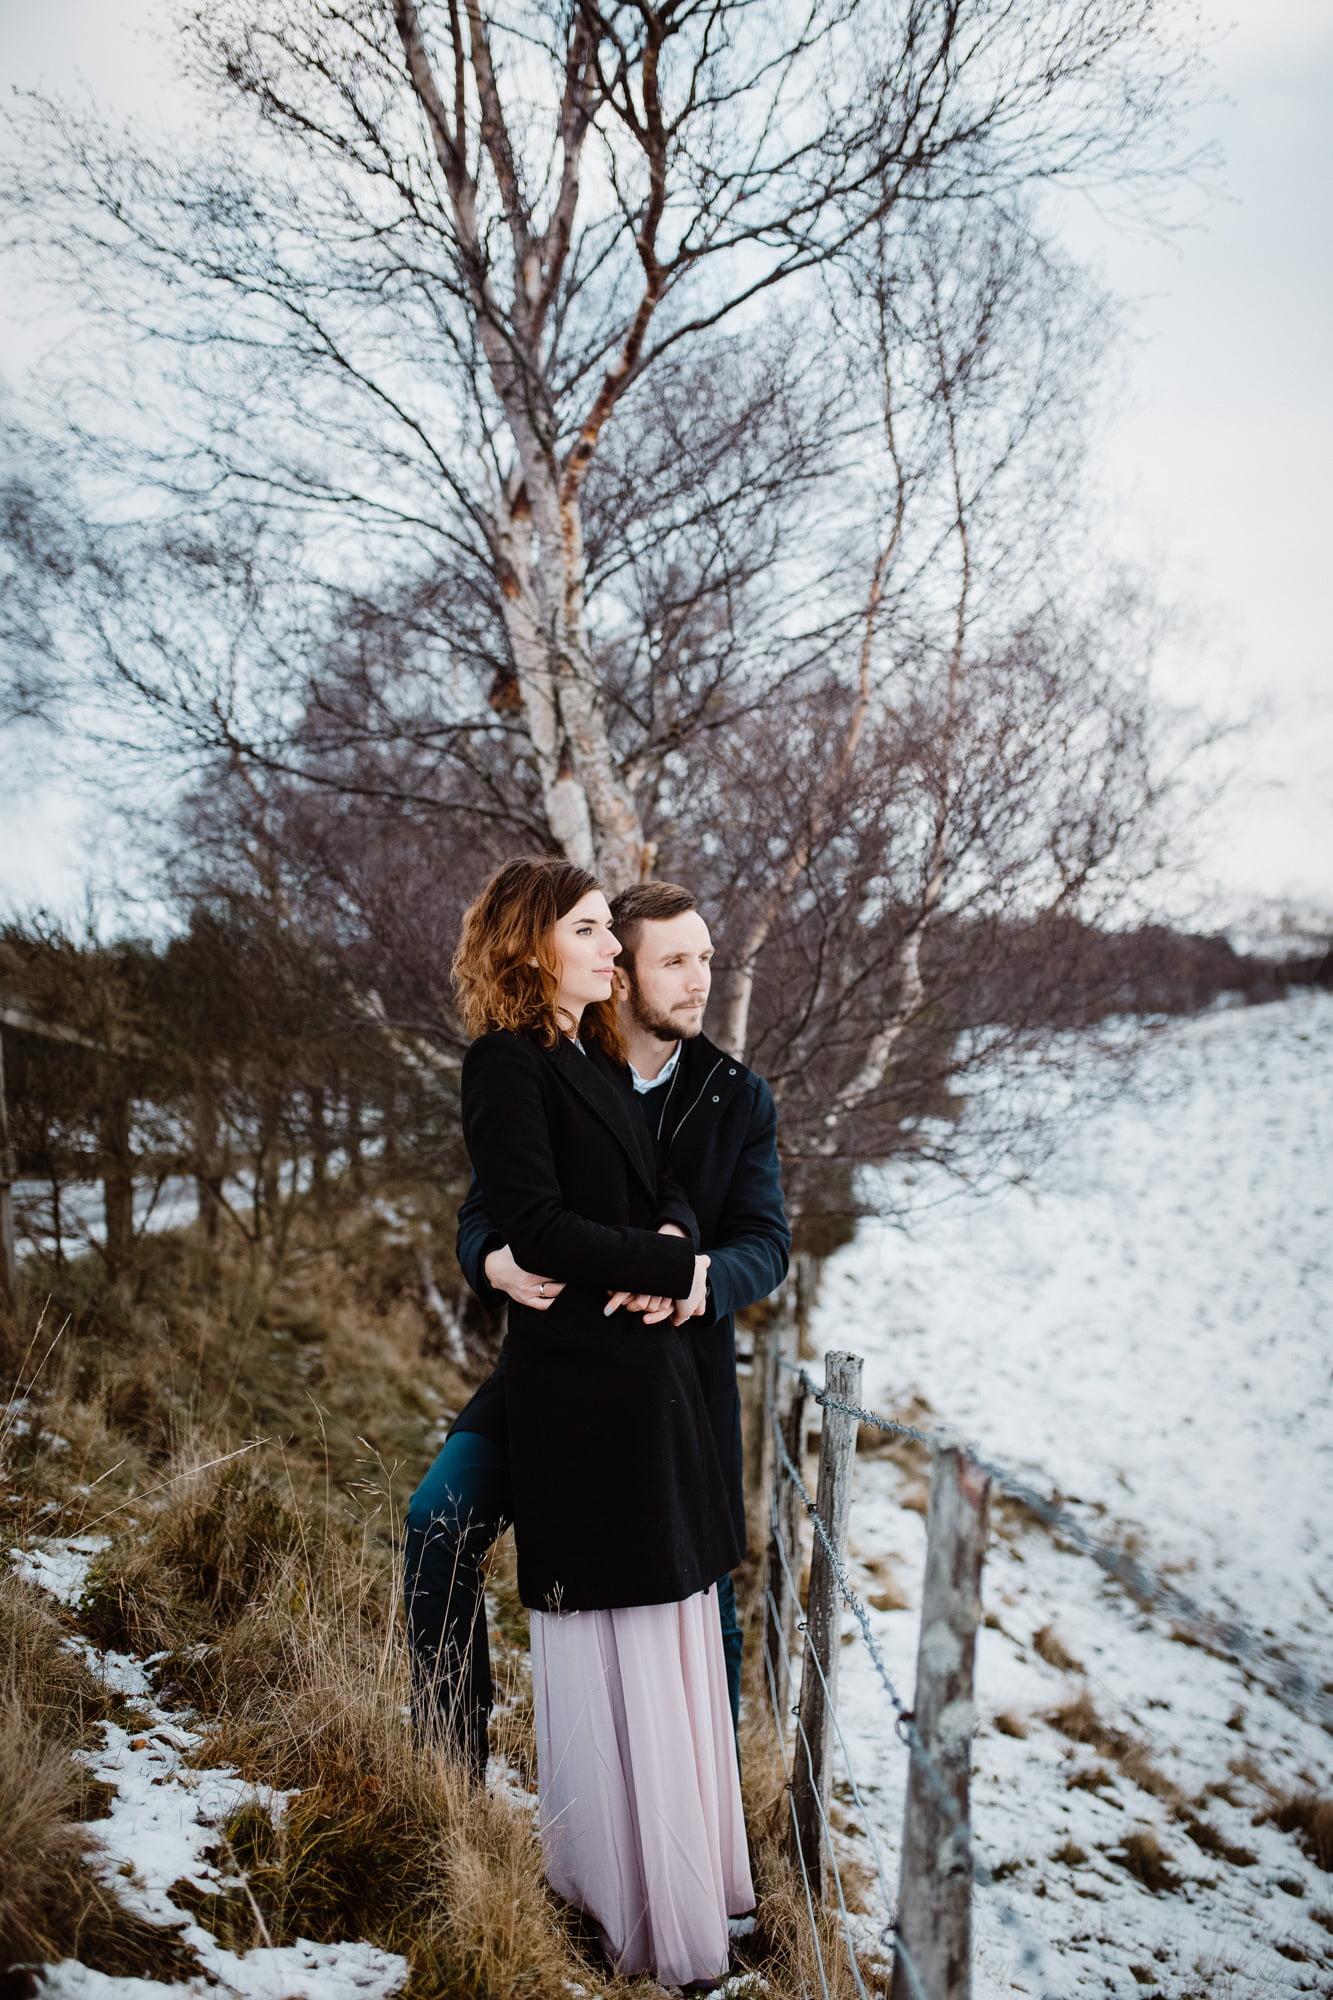 Clova couple session, winter in Scotland, winter in Cairngorms National Park, winter in Glen Clova, Winter in Clova